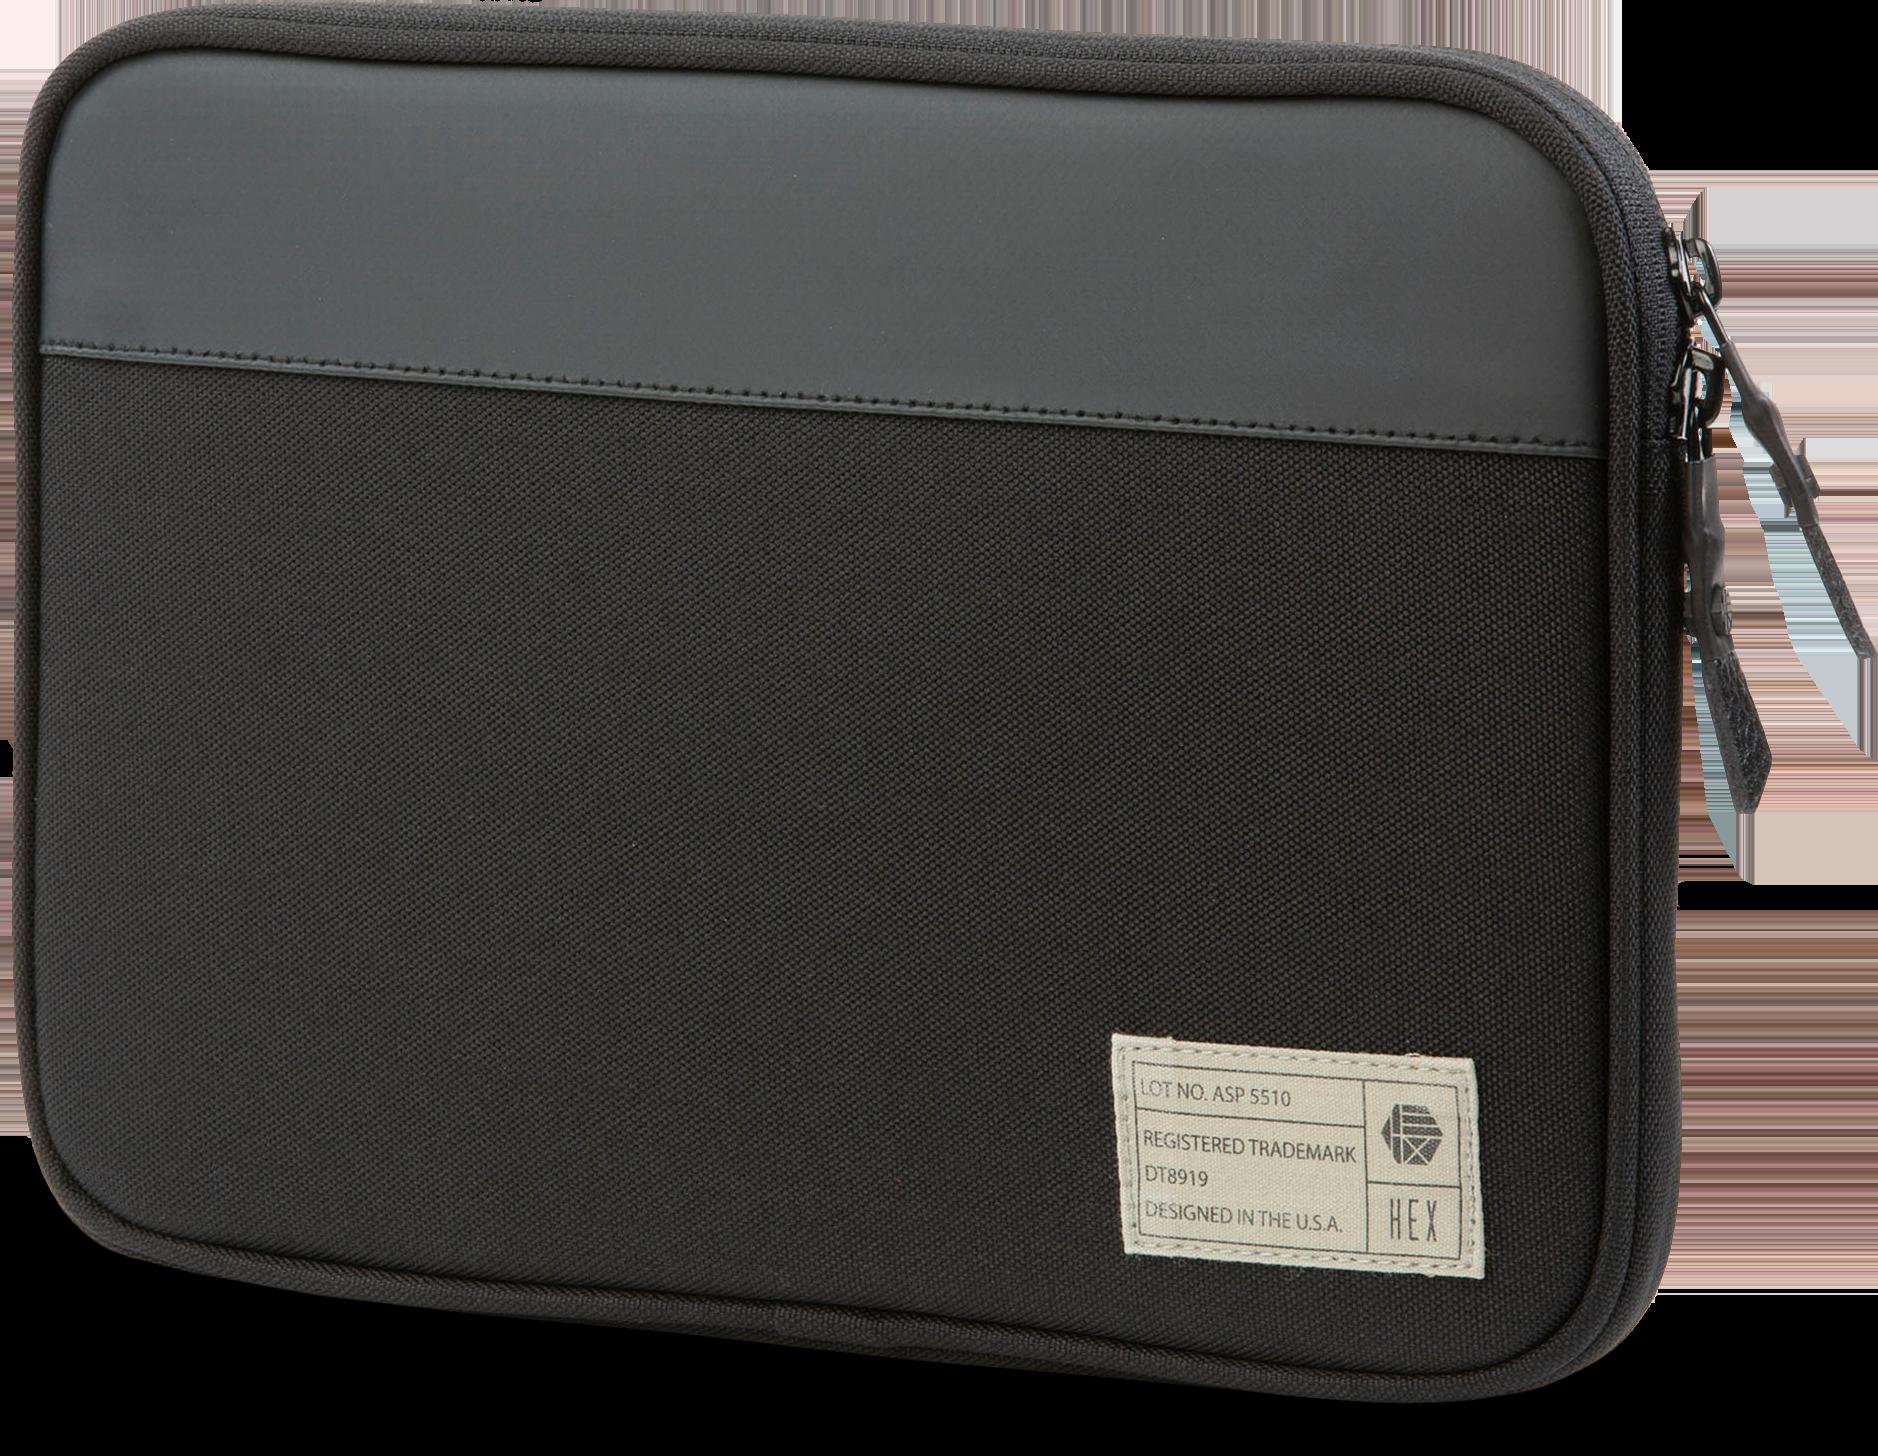 HEX Surface Go Sleeve in Black (Nylon)